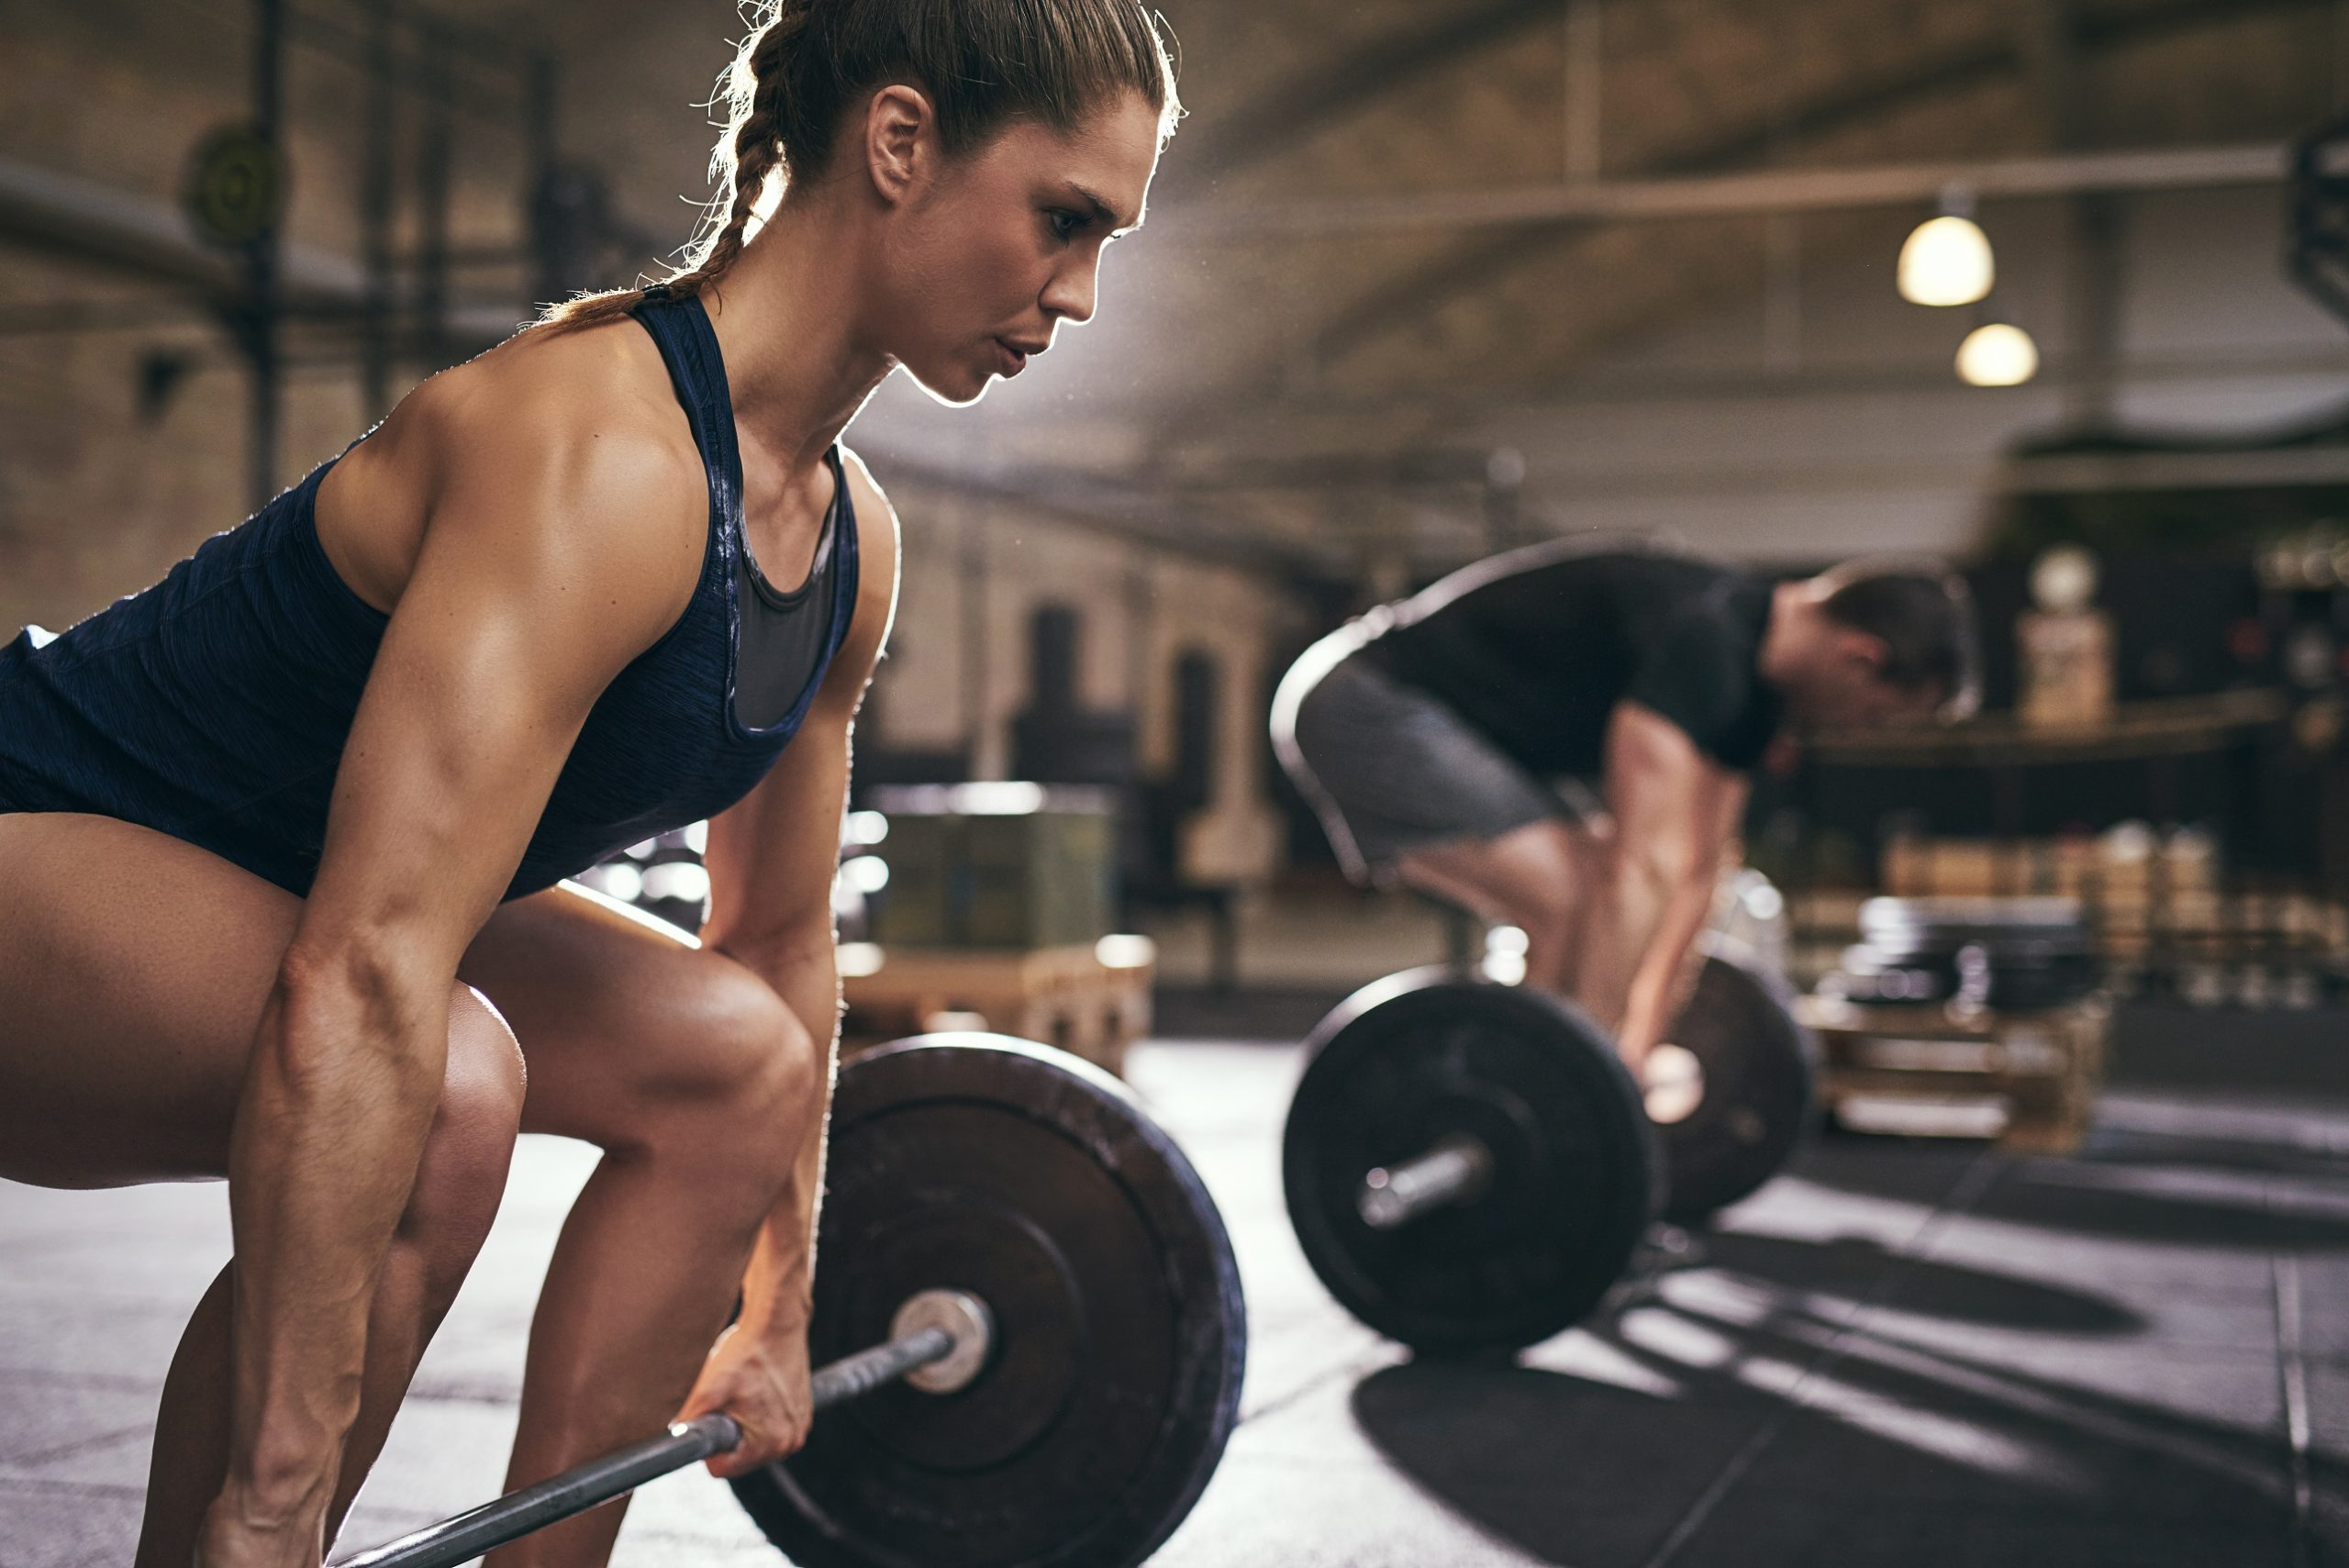 StrengthLog Minimalistic Routine